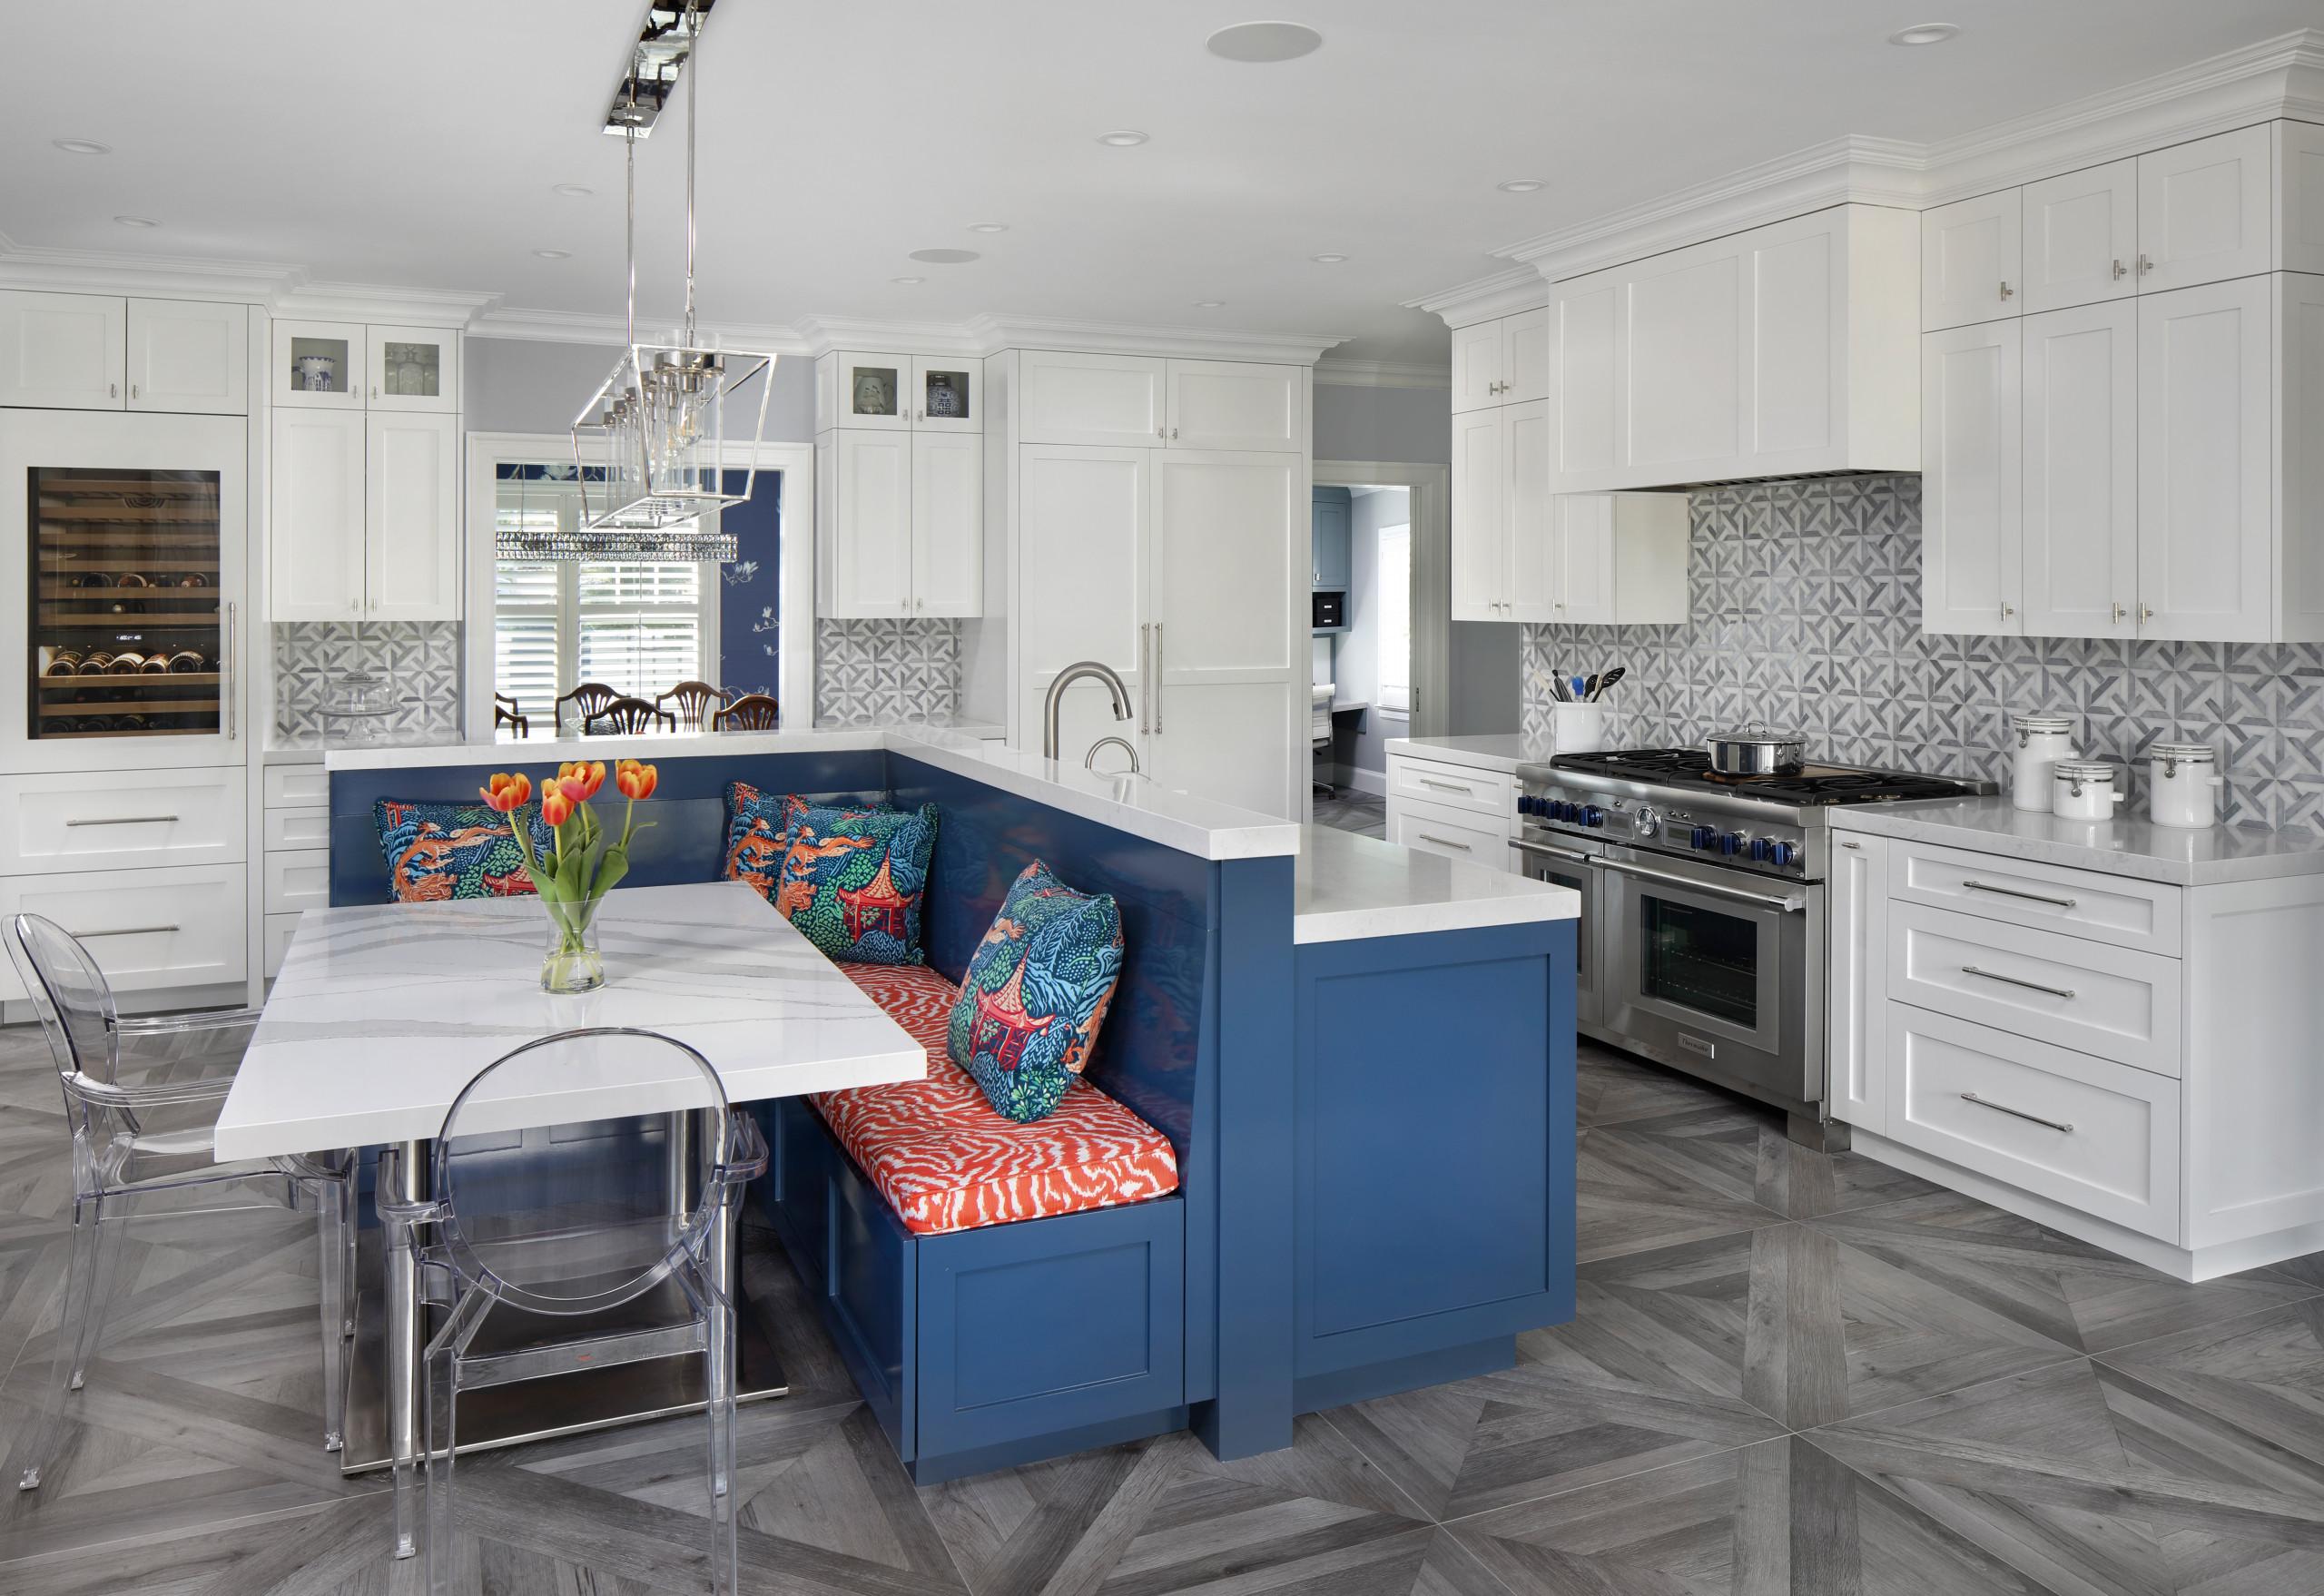 Colonial Revival - modern farmhouse kitchen